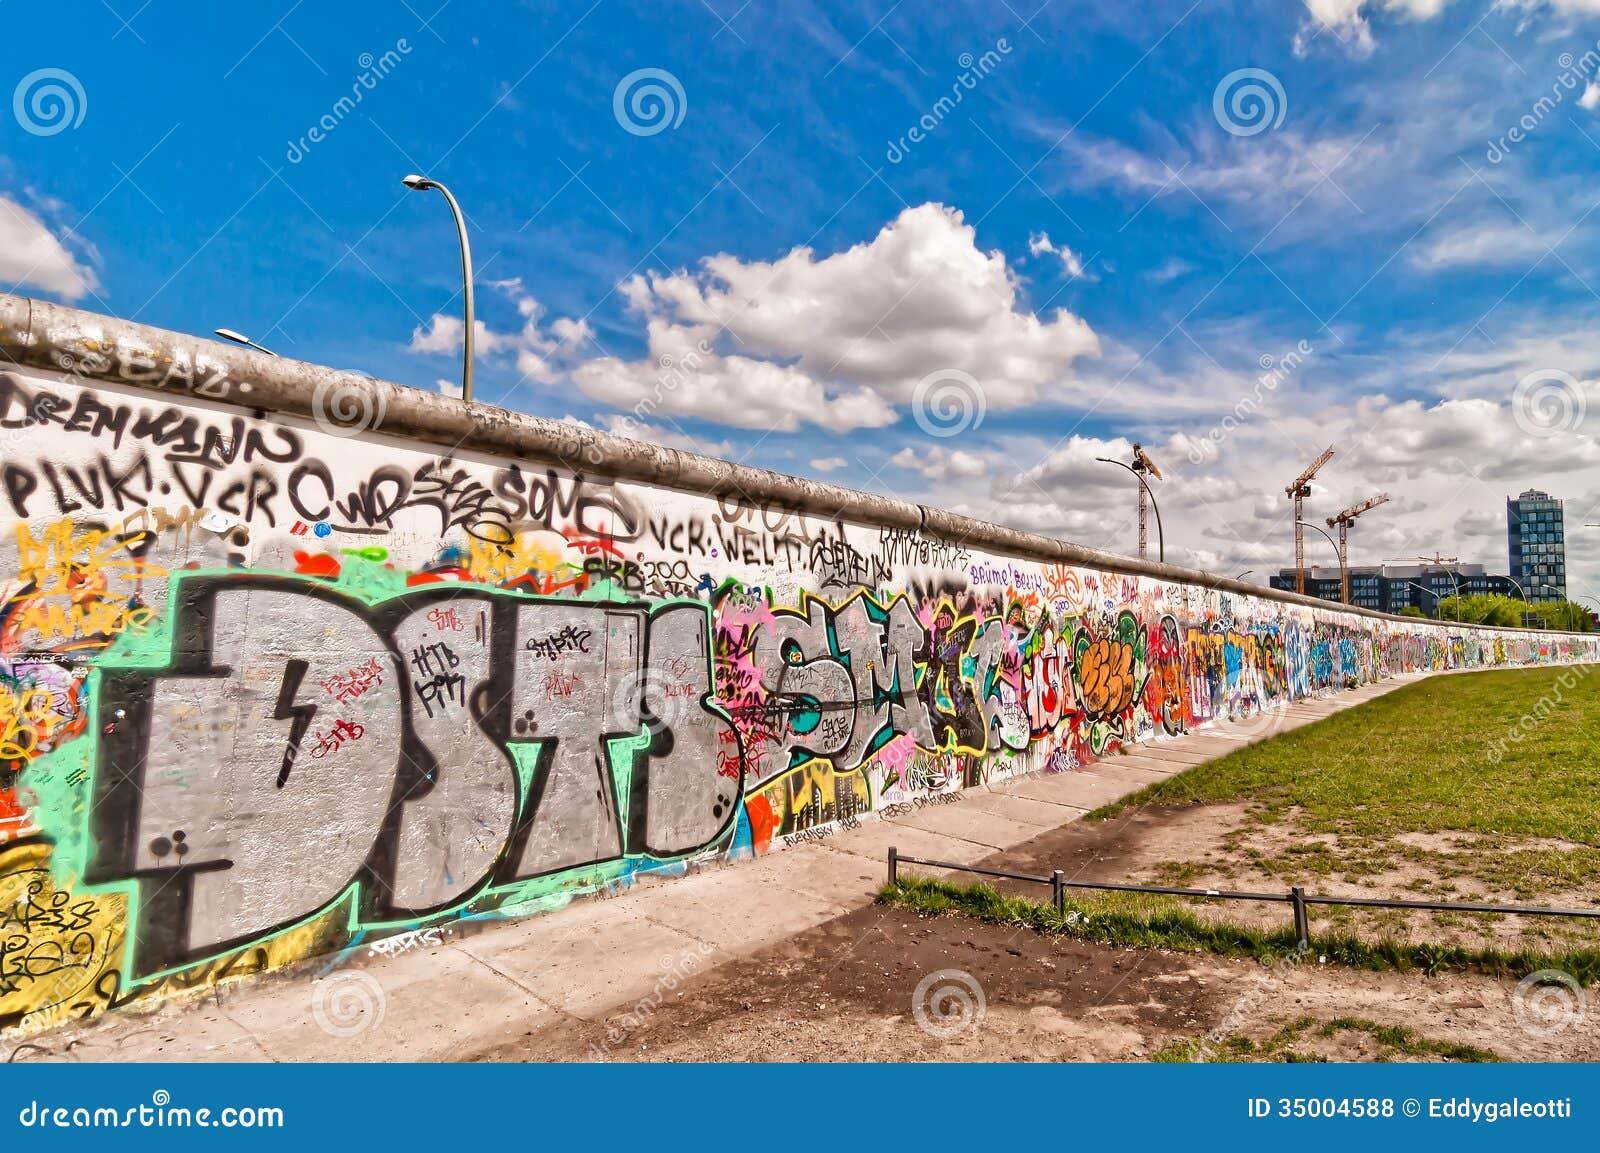 Graffiti wall clipart - Editorial Stock Photo